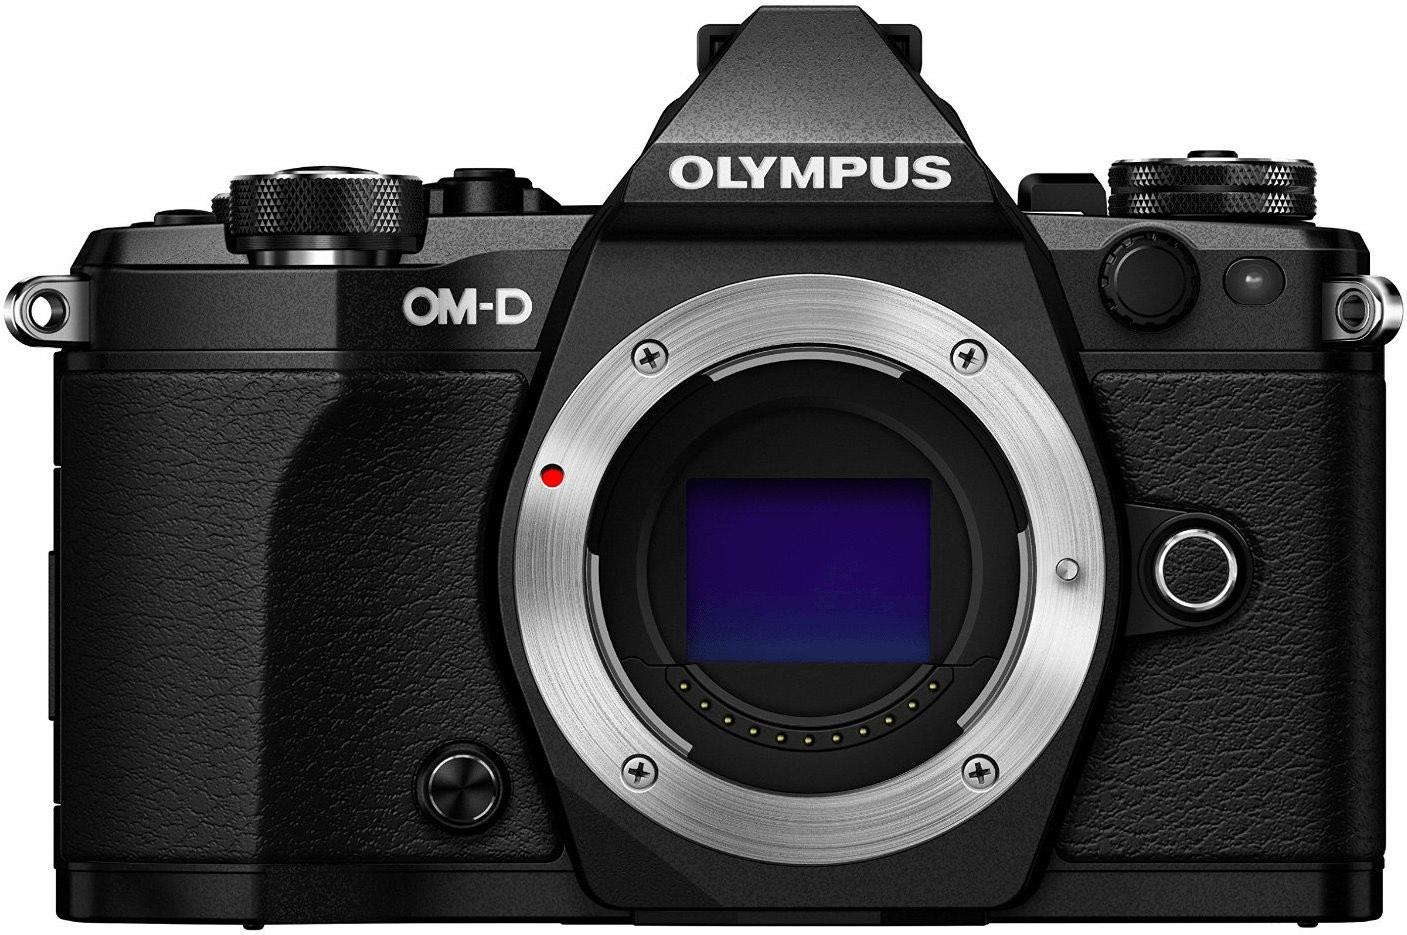 Kamera & Objektiv Sammeldeal für Olympus, Sony, Fujifilm, Panasonic, Tamron, Sigma, Samyang, etc. - z.B. Olympus OM-D E-M5 Mark II